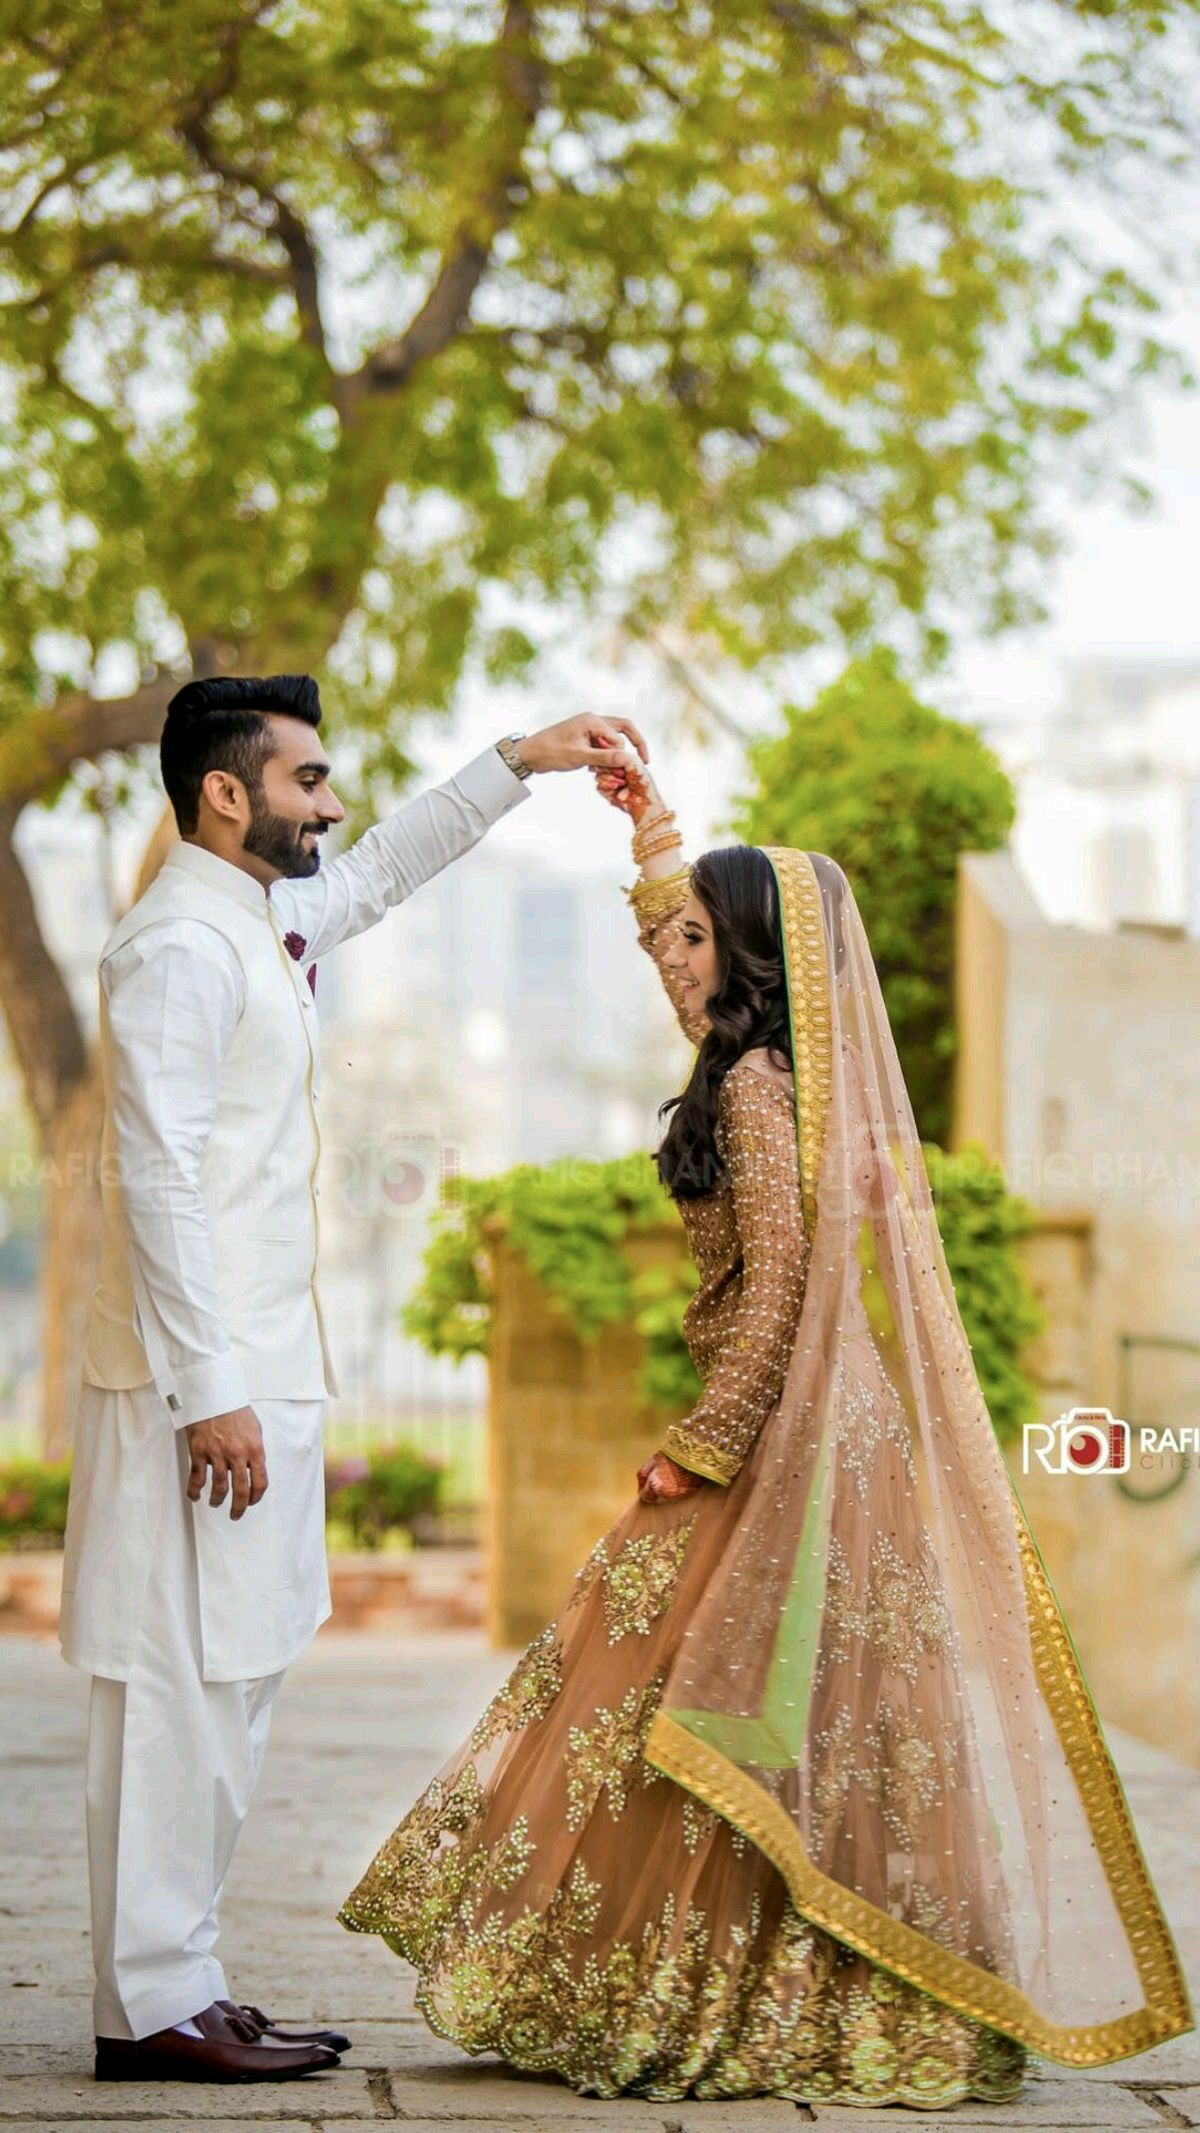 Pin by zam on nikaah in pinterest pakistani wedding dresses